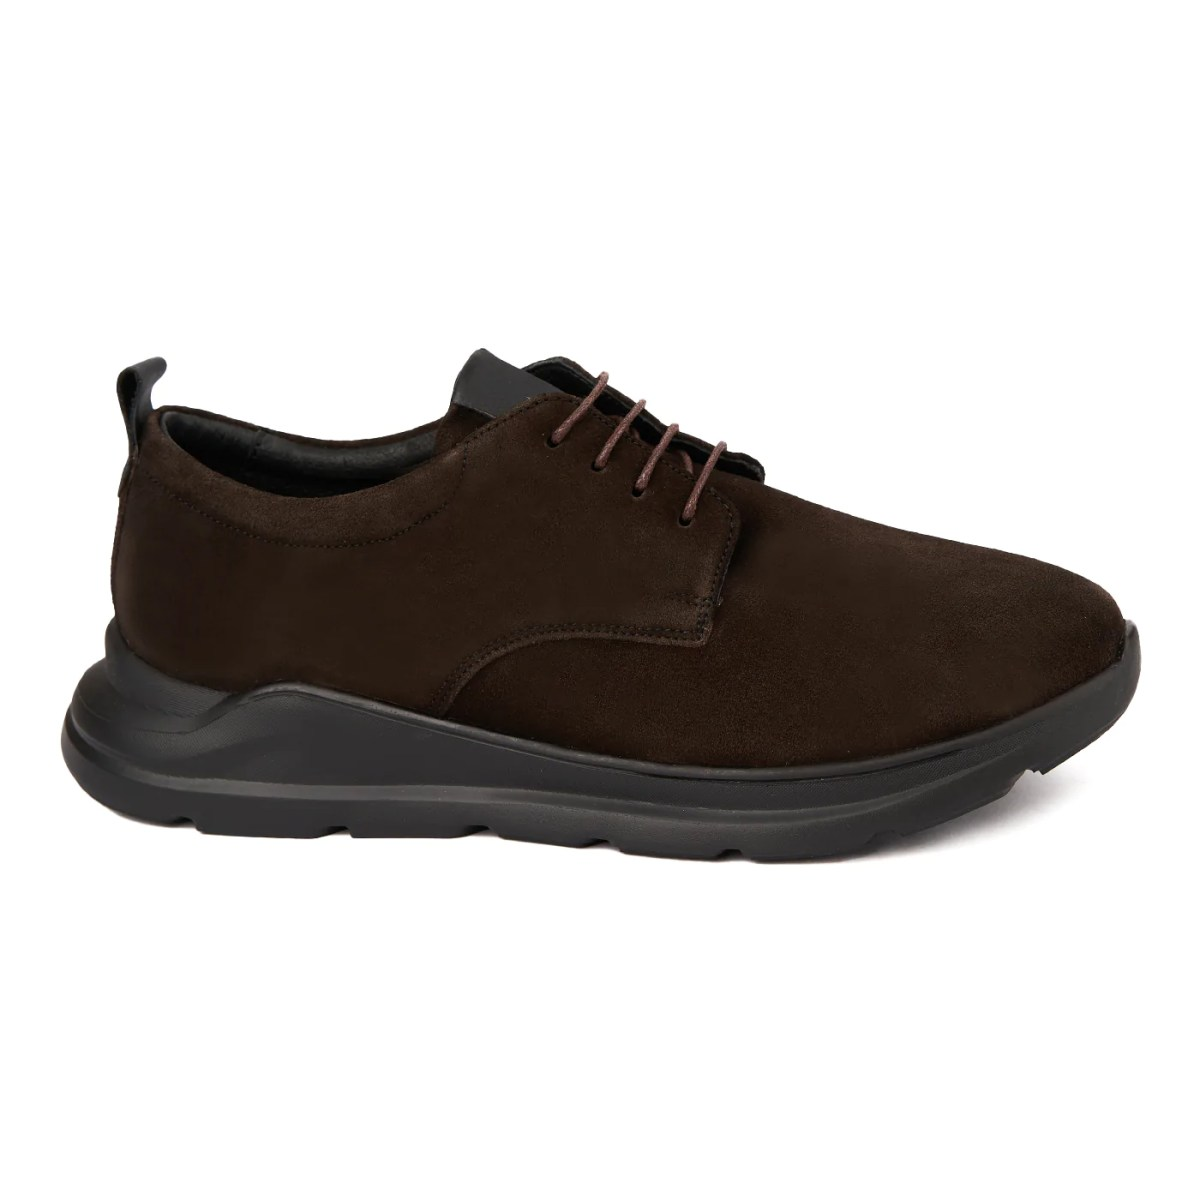 Pantofi barbati casual din piele naturala 0233